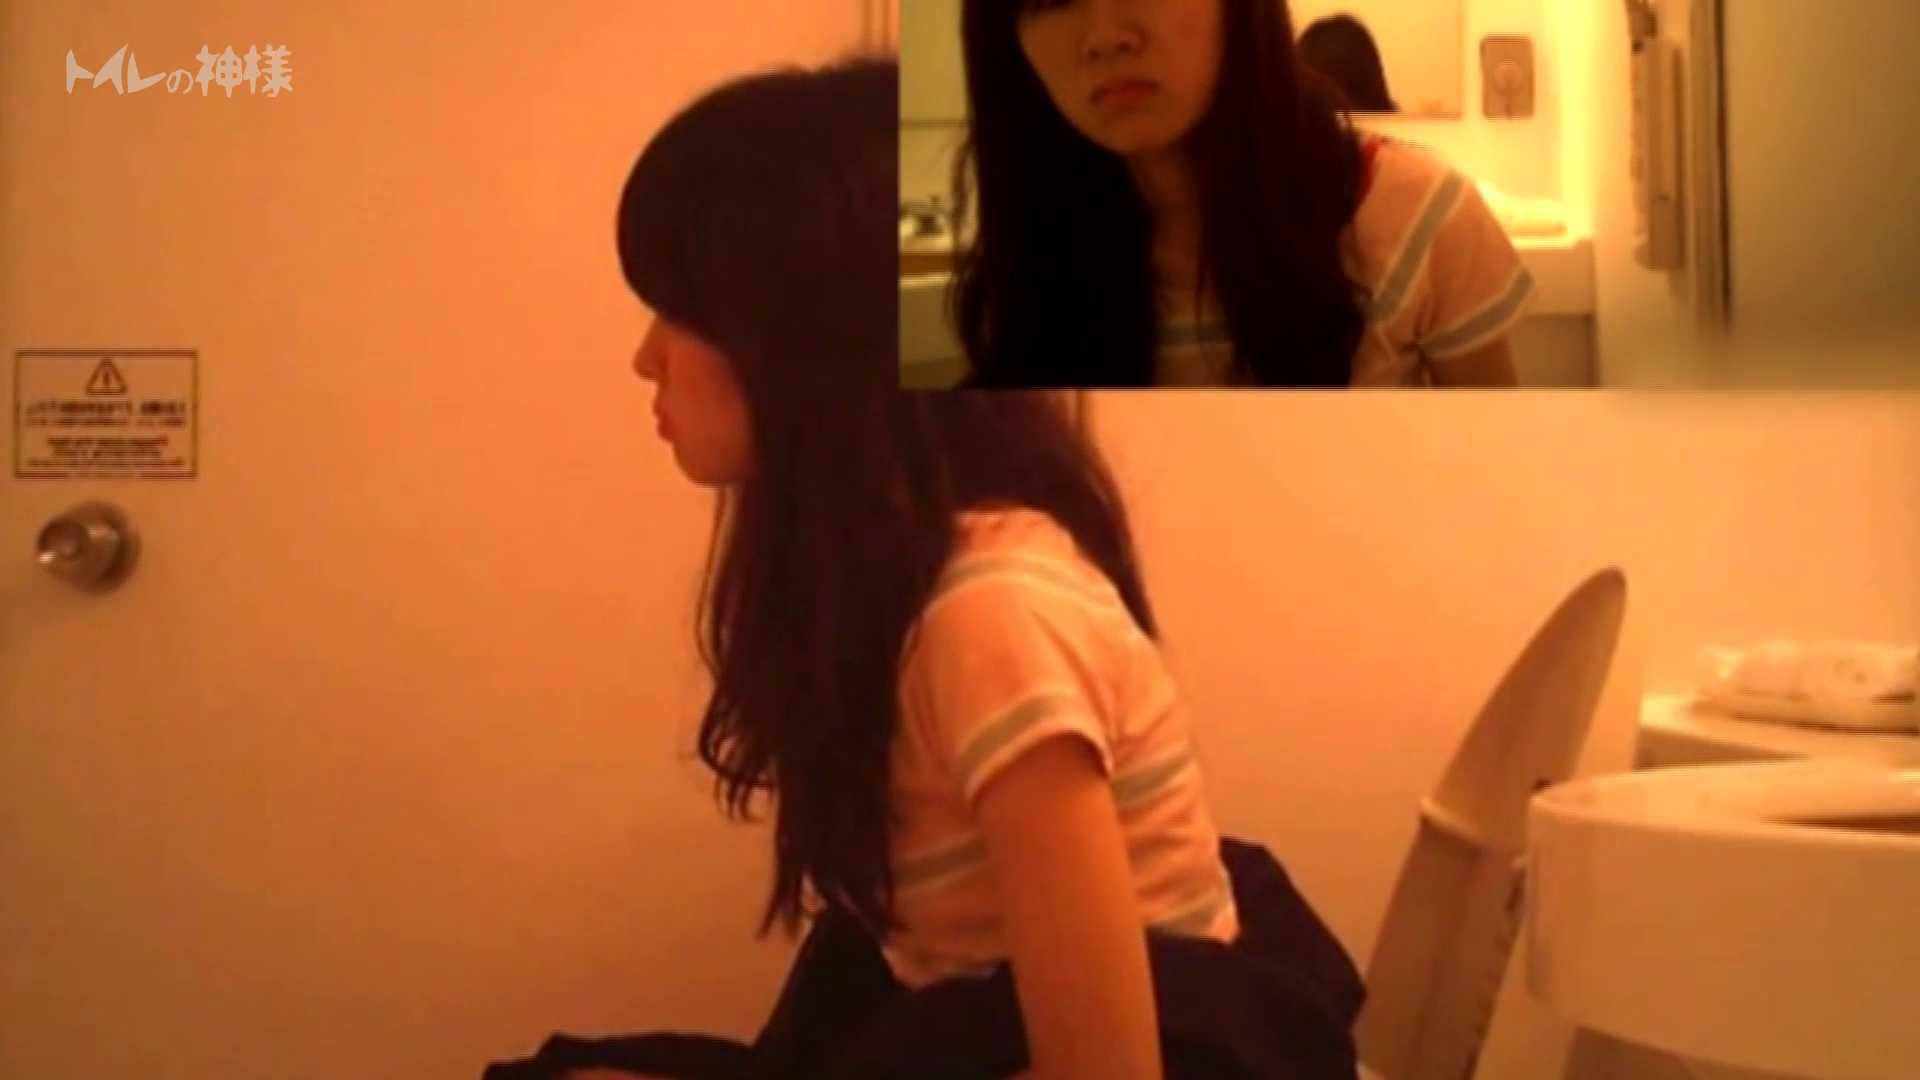 Vol.04 女子大生のトイレ恥態 OLハメ撮り  104Pix 92